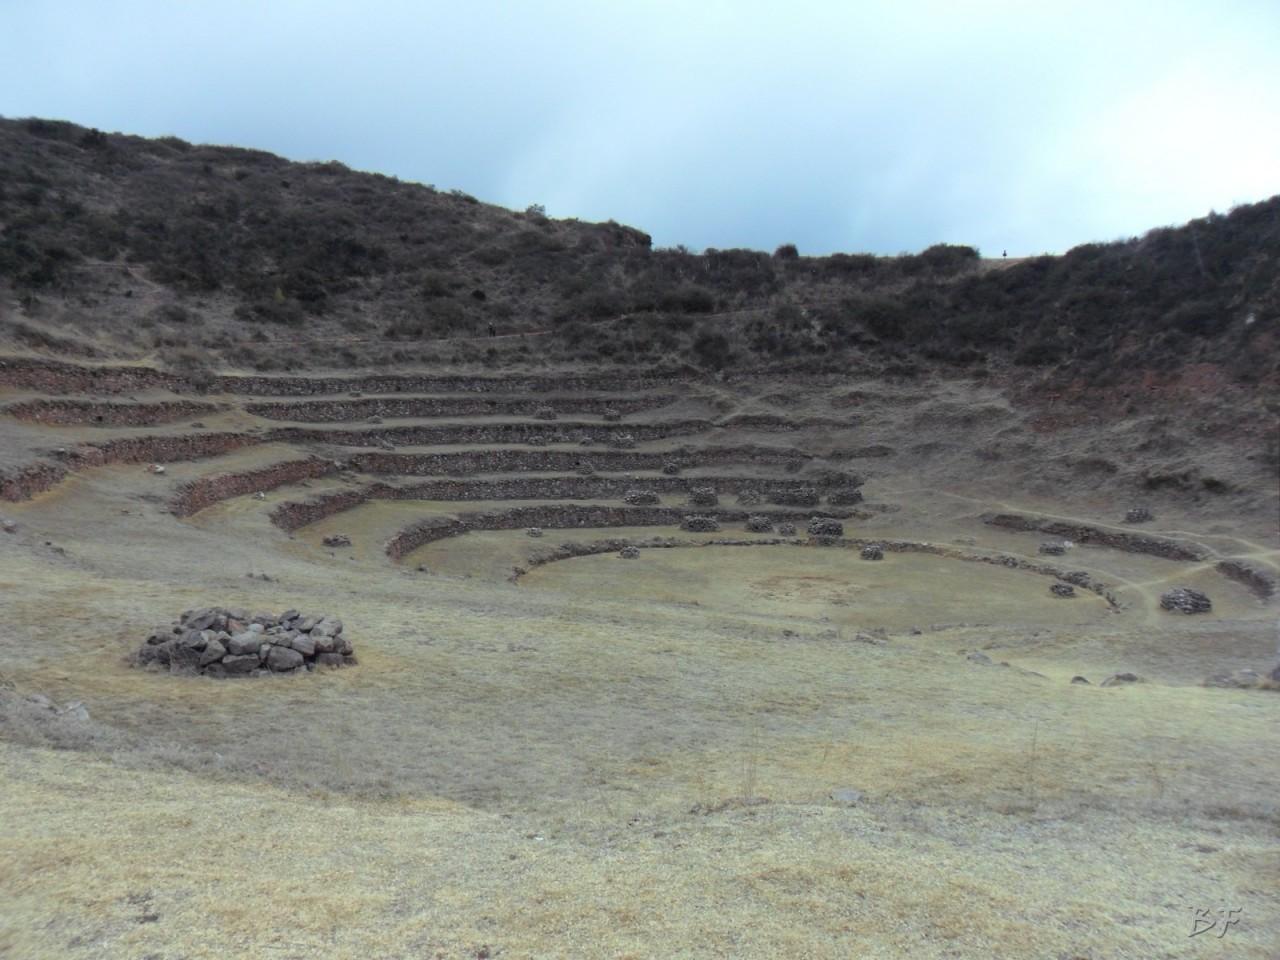 Terrazze-Circolari-Megaliti-Moray-Saline-Maras-Cusco-Perù-5